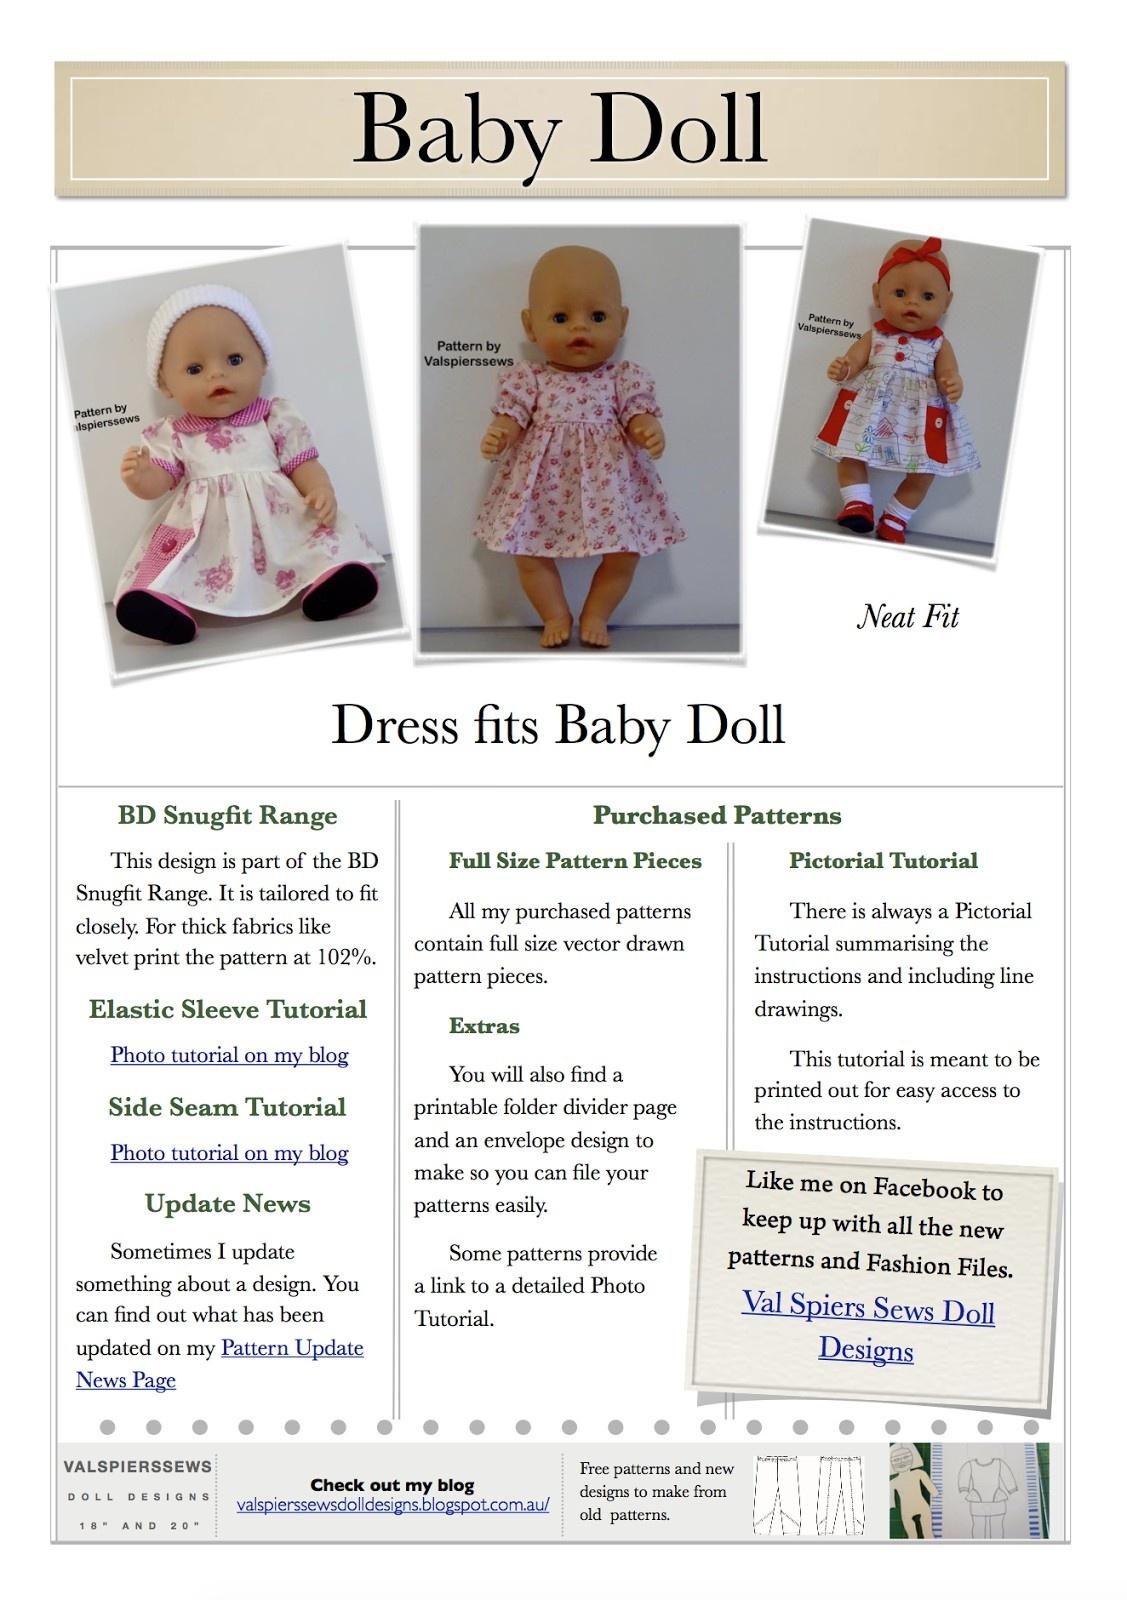 Free Printable American Girl Doll Clothes Patterns Lovely Doll - American Girl Clothes Patterns Free Printable